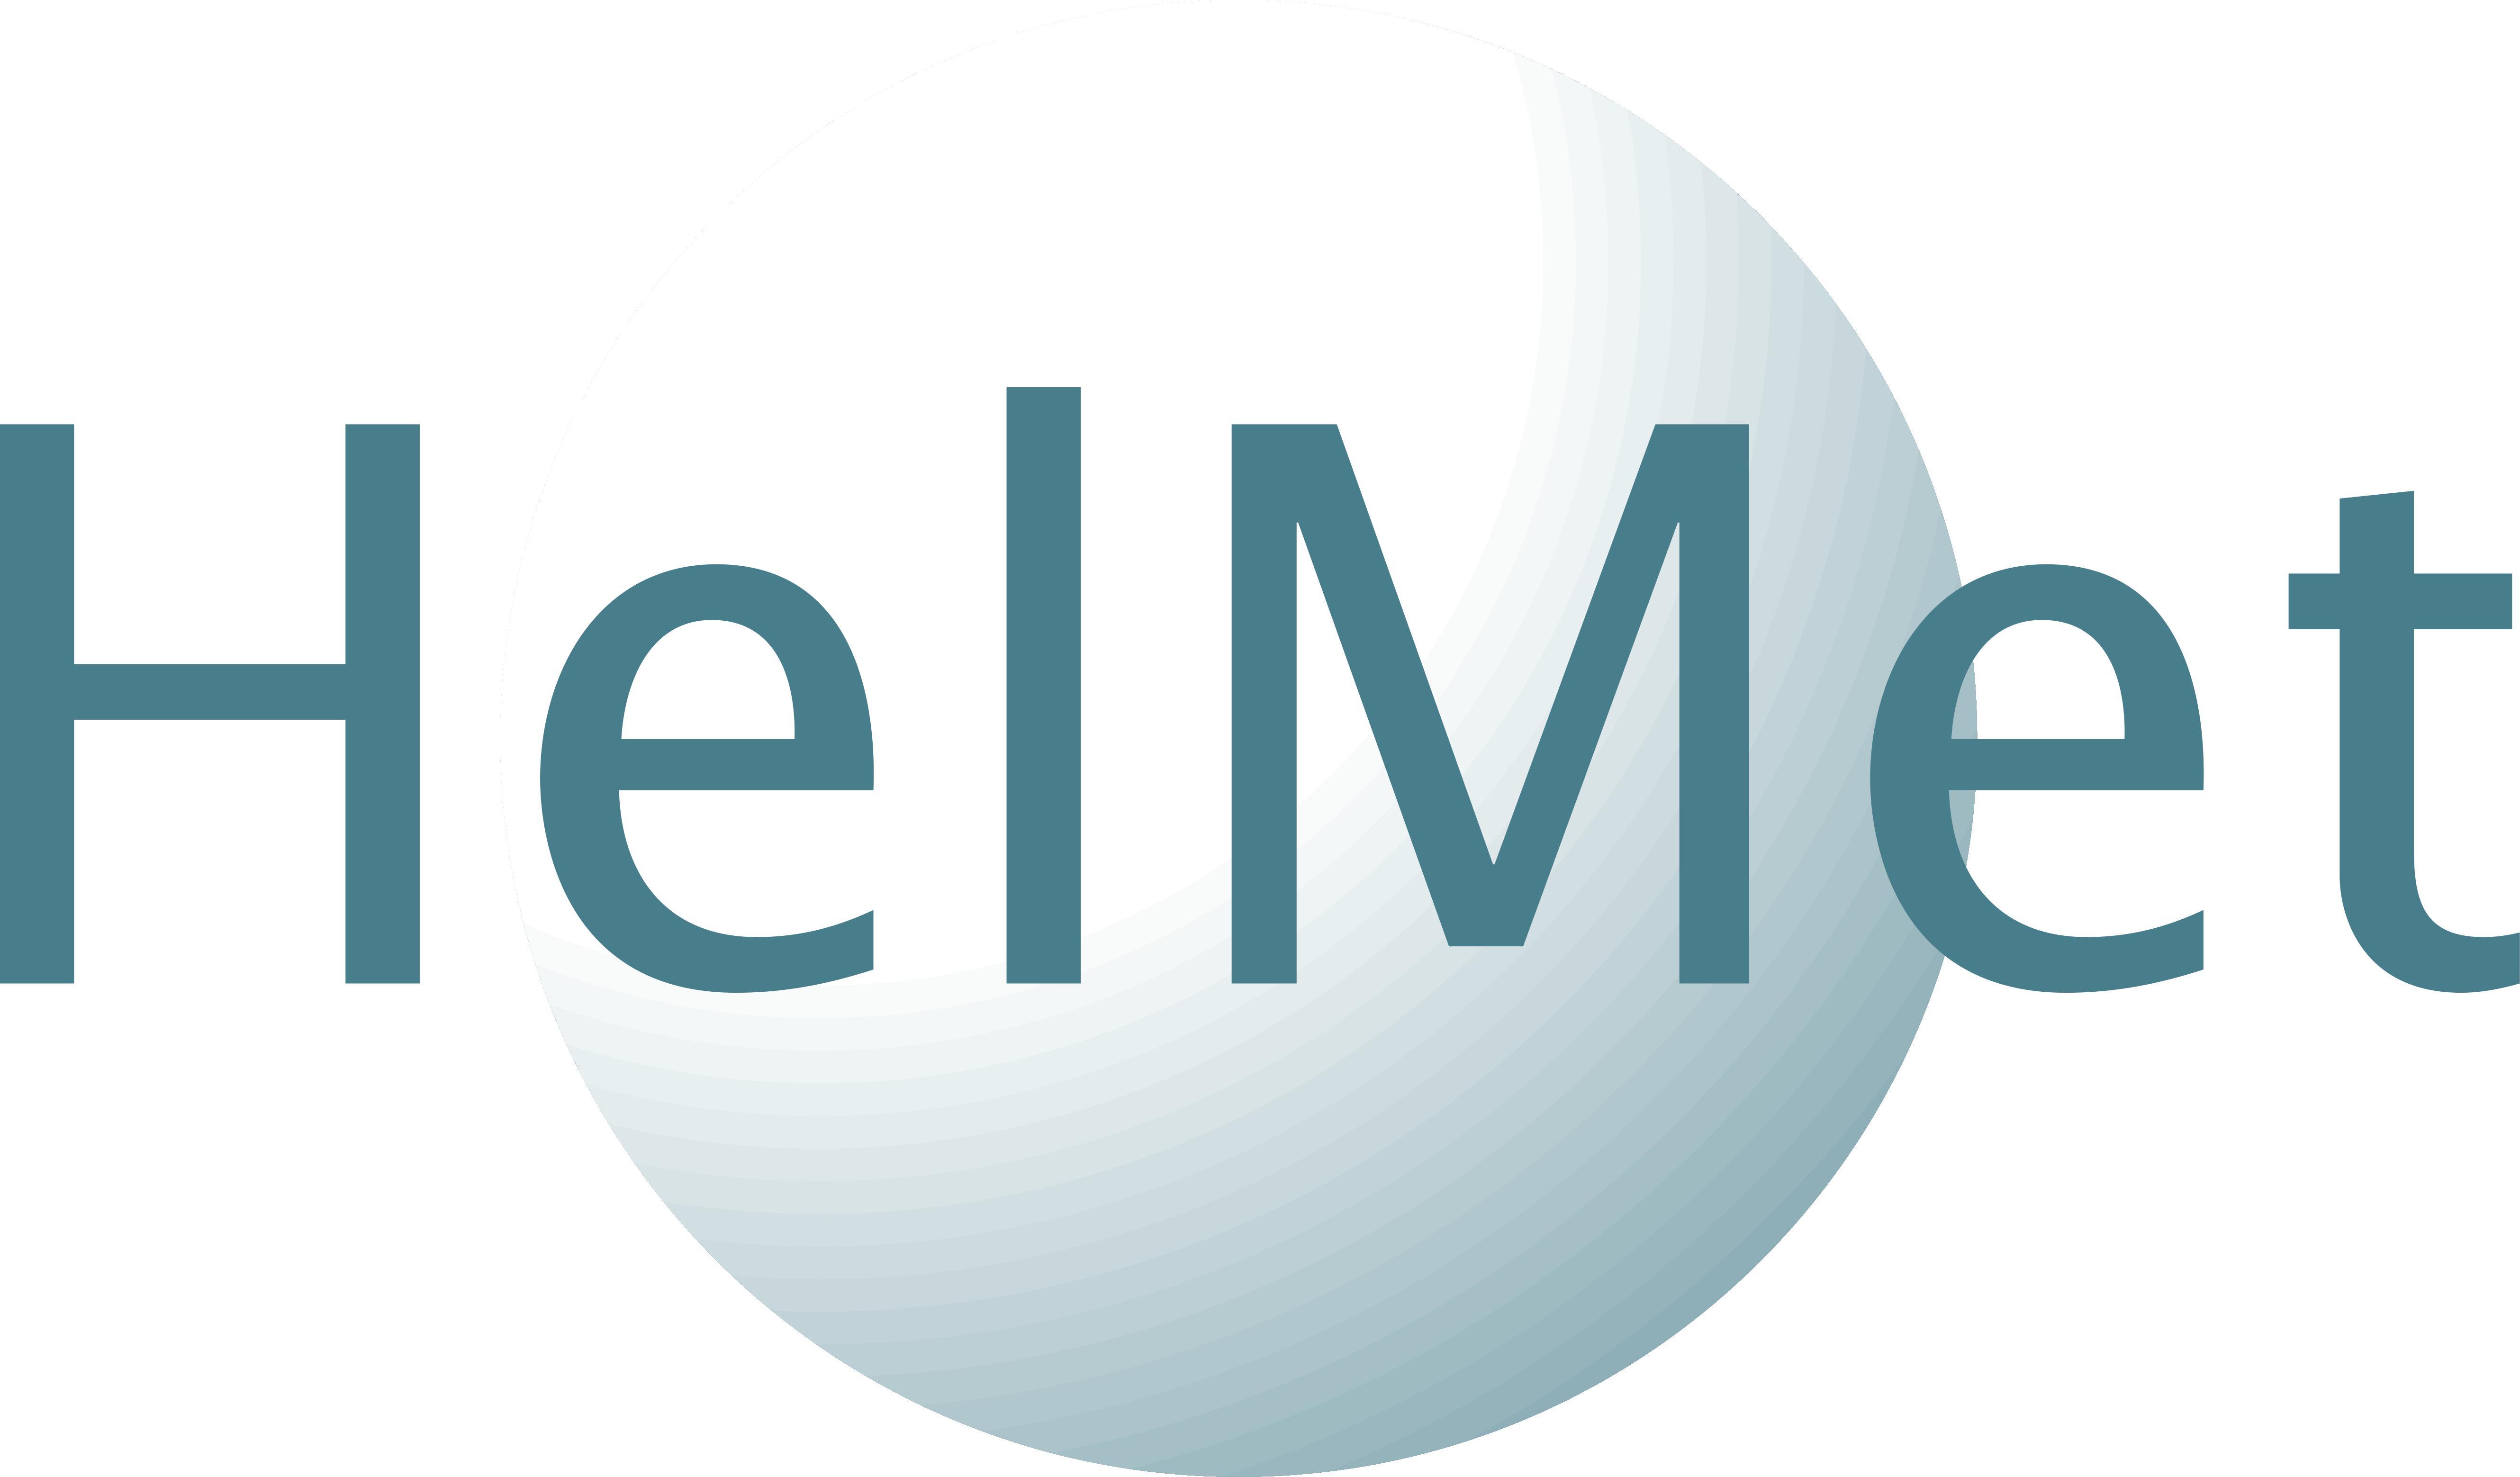 Helmetin logo